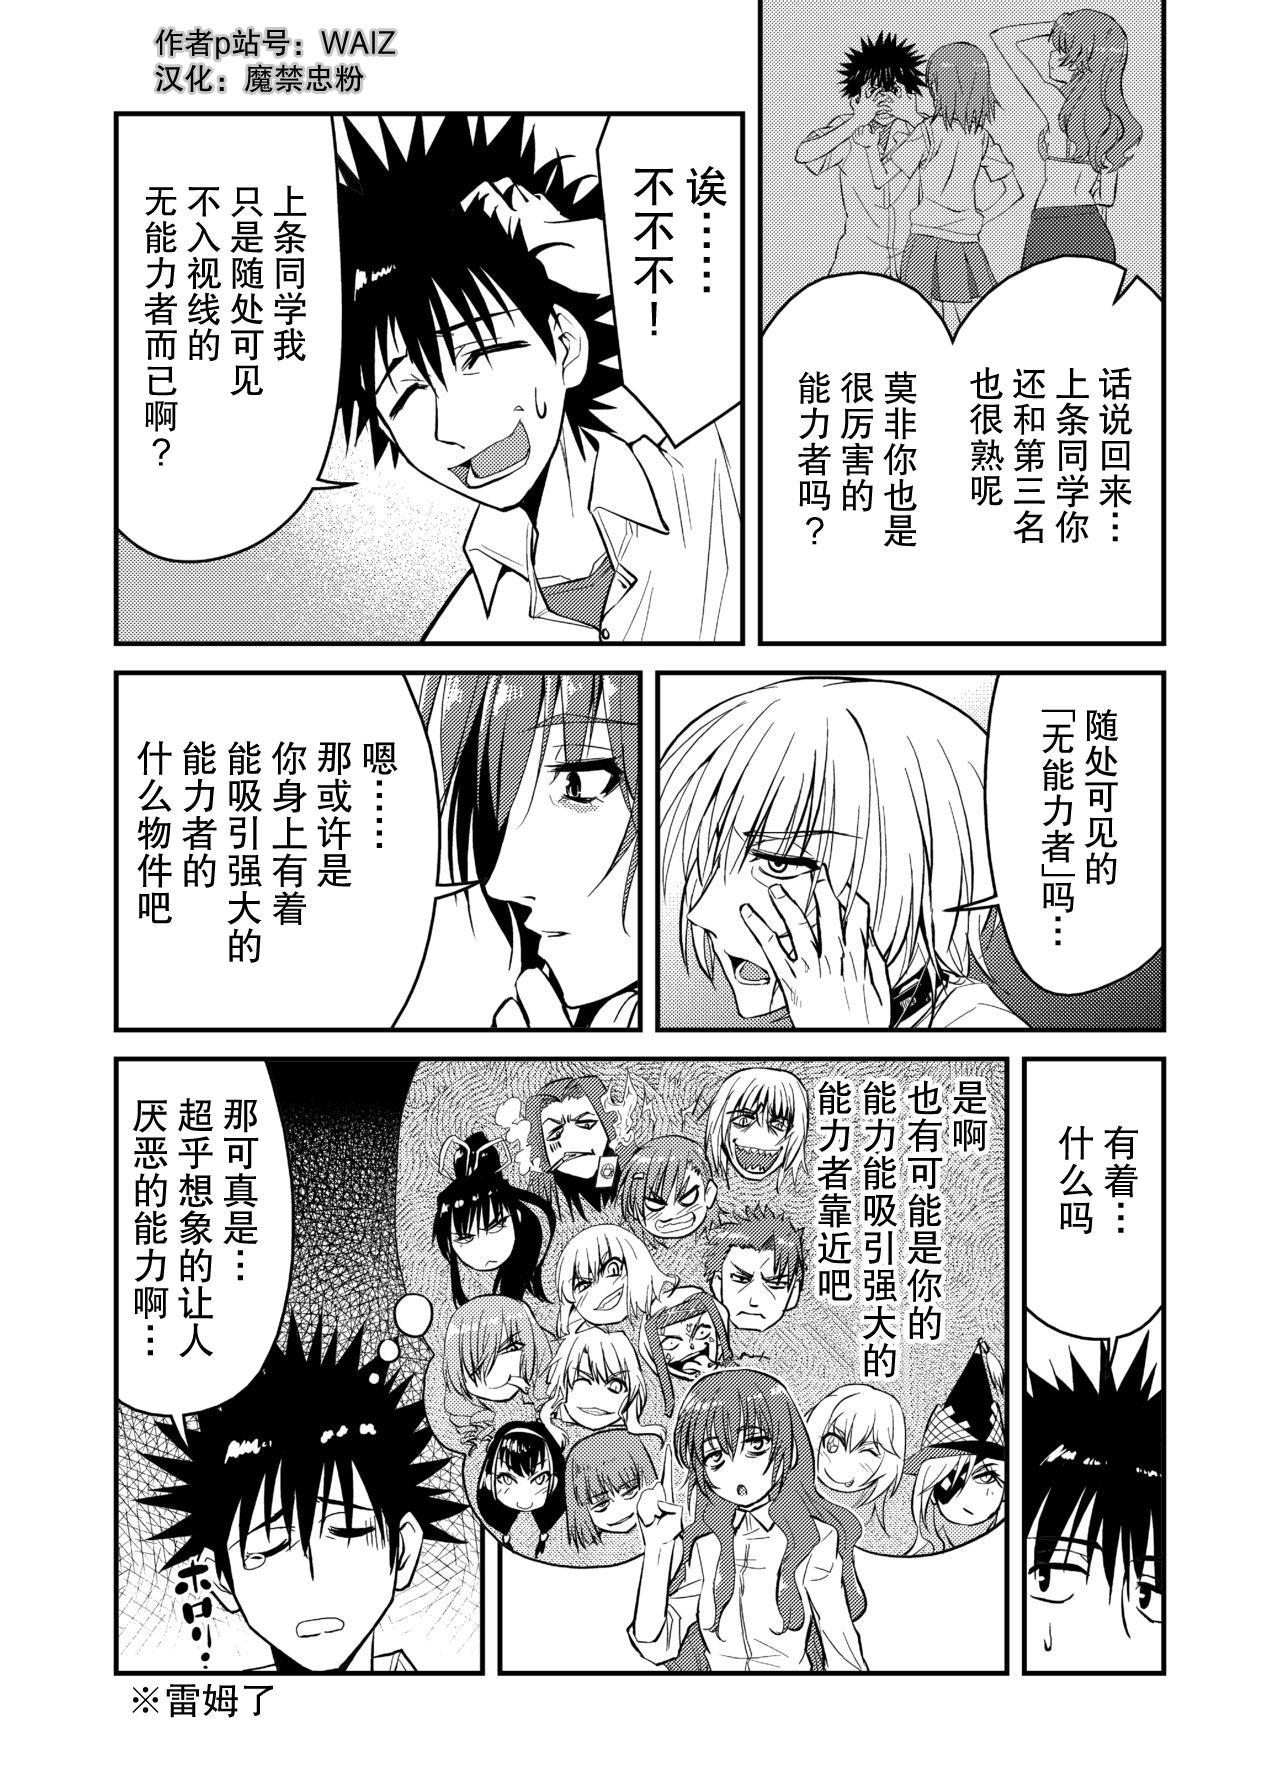 [WAIZ][同人个人渣汉化][就算是上条先生我家要住7个人还是太勉强了](Toaru Majutsu no Index) [中国翻译] 21